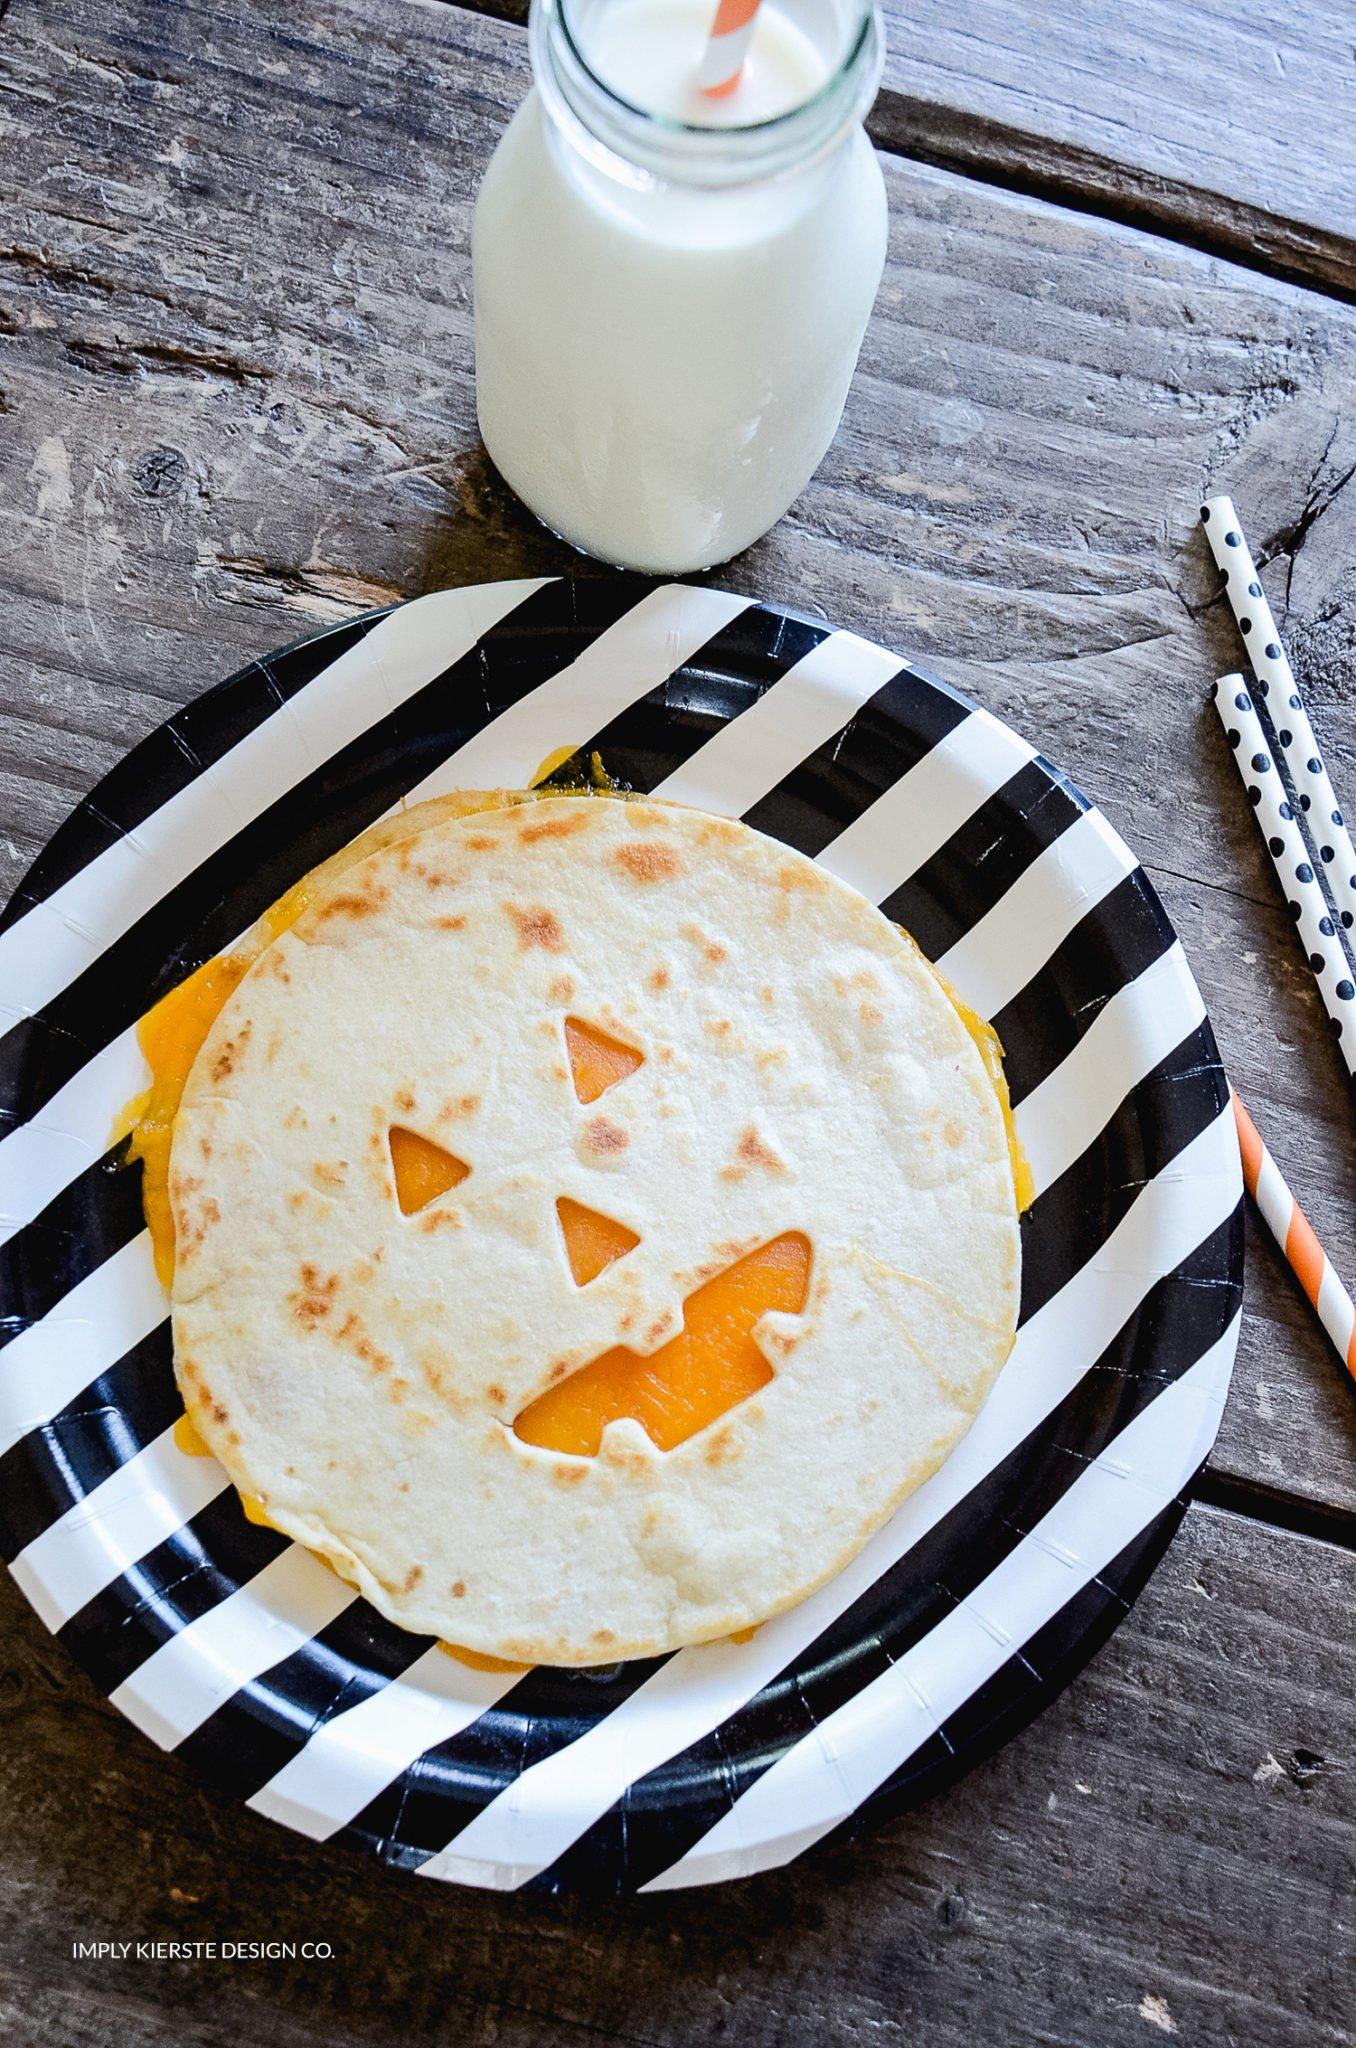 Jack-o-lantern Quesadillas | Easy Halloween Ideas | Halloween Dinner Ideas | simplykierste.com